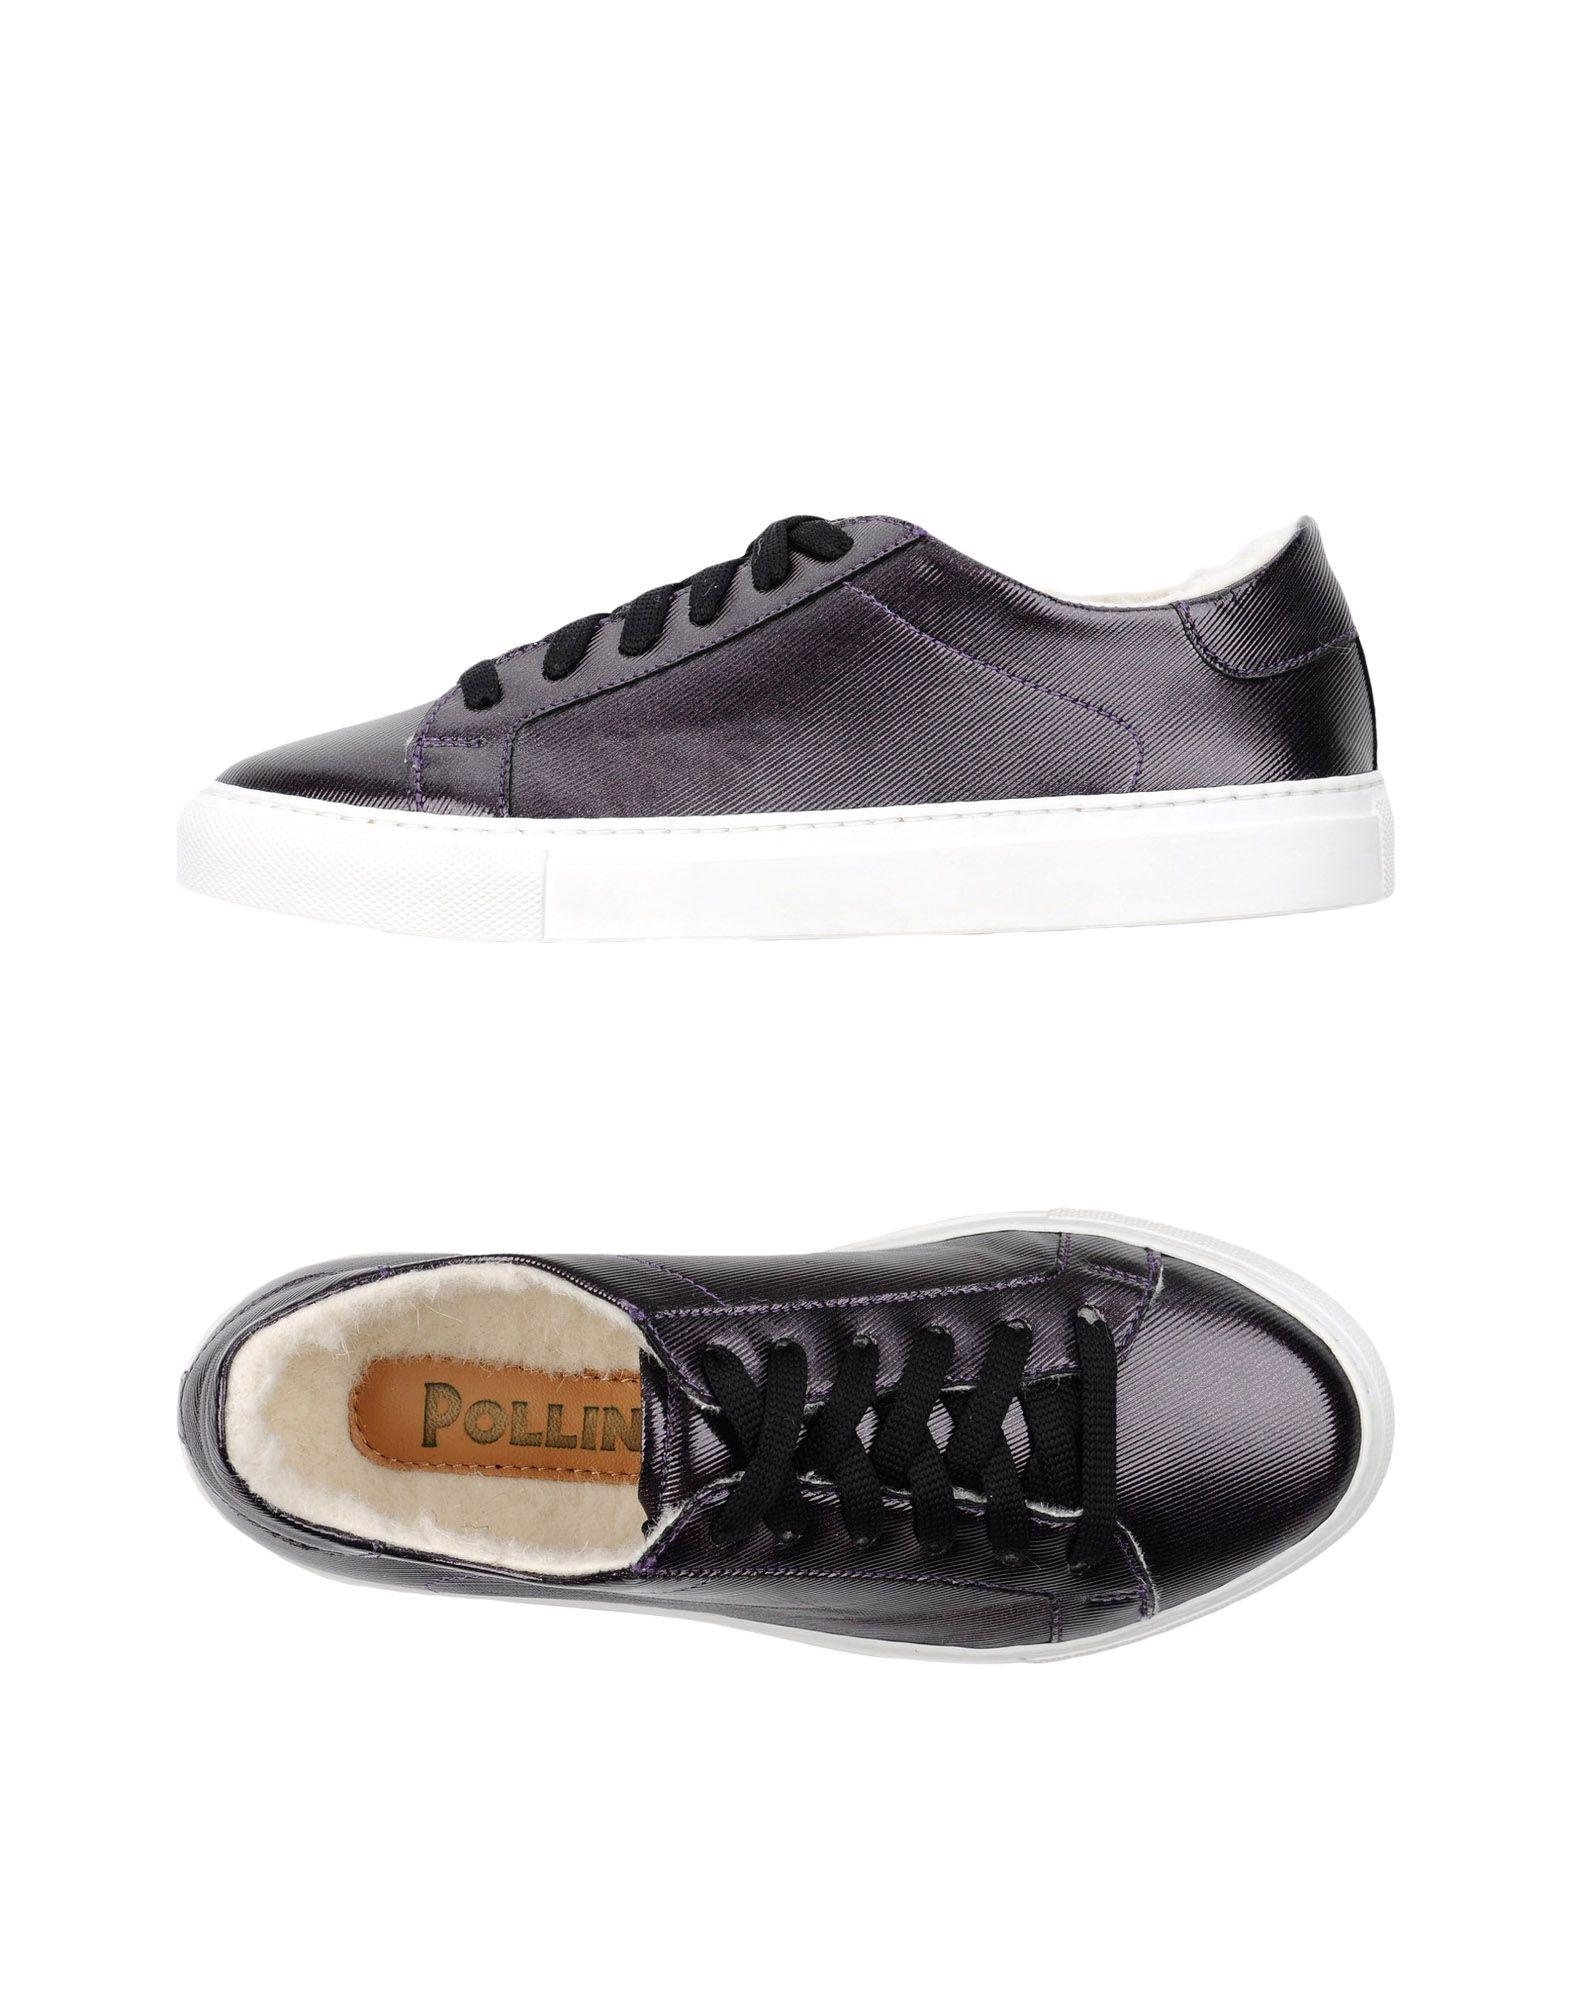 Pollini Sneakers Damen  11341427HX Gute Qualität beliebte Schuhe